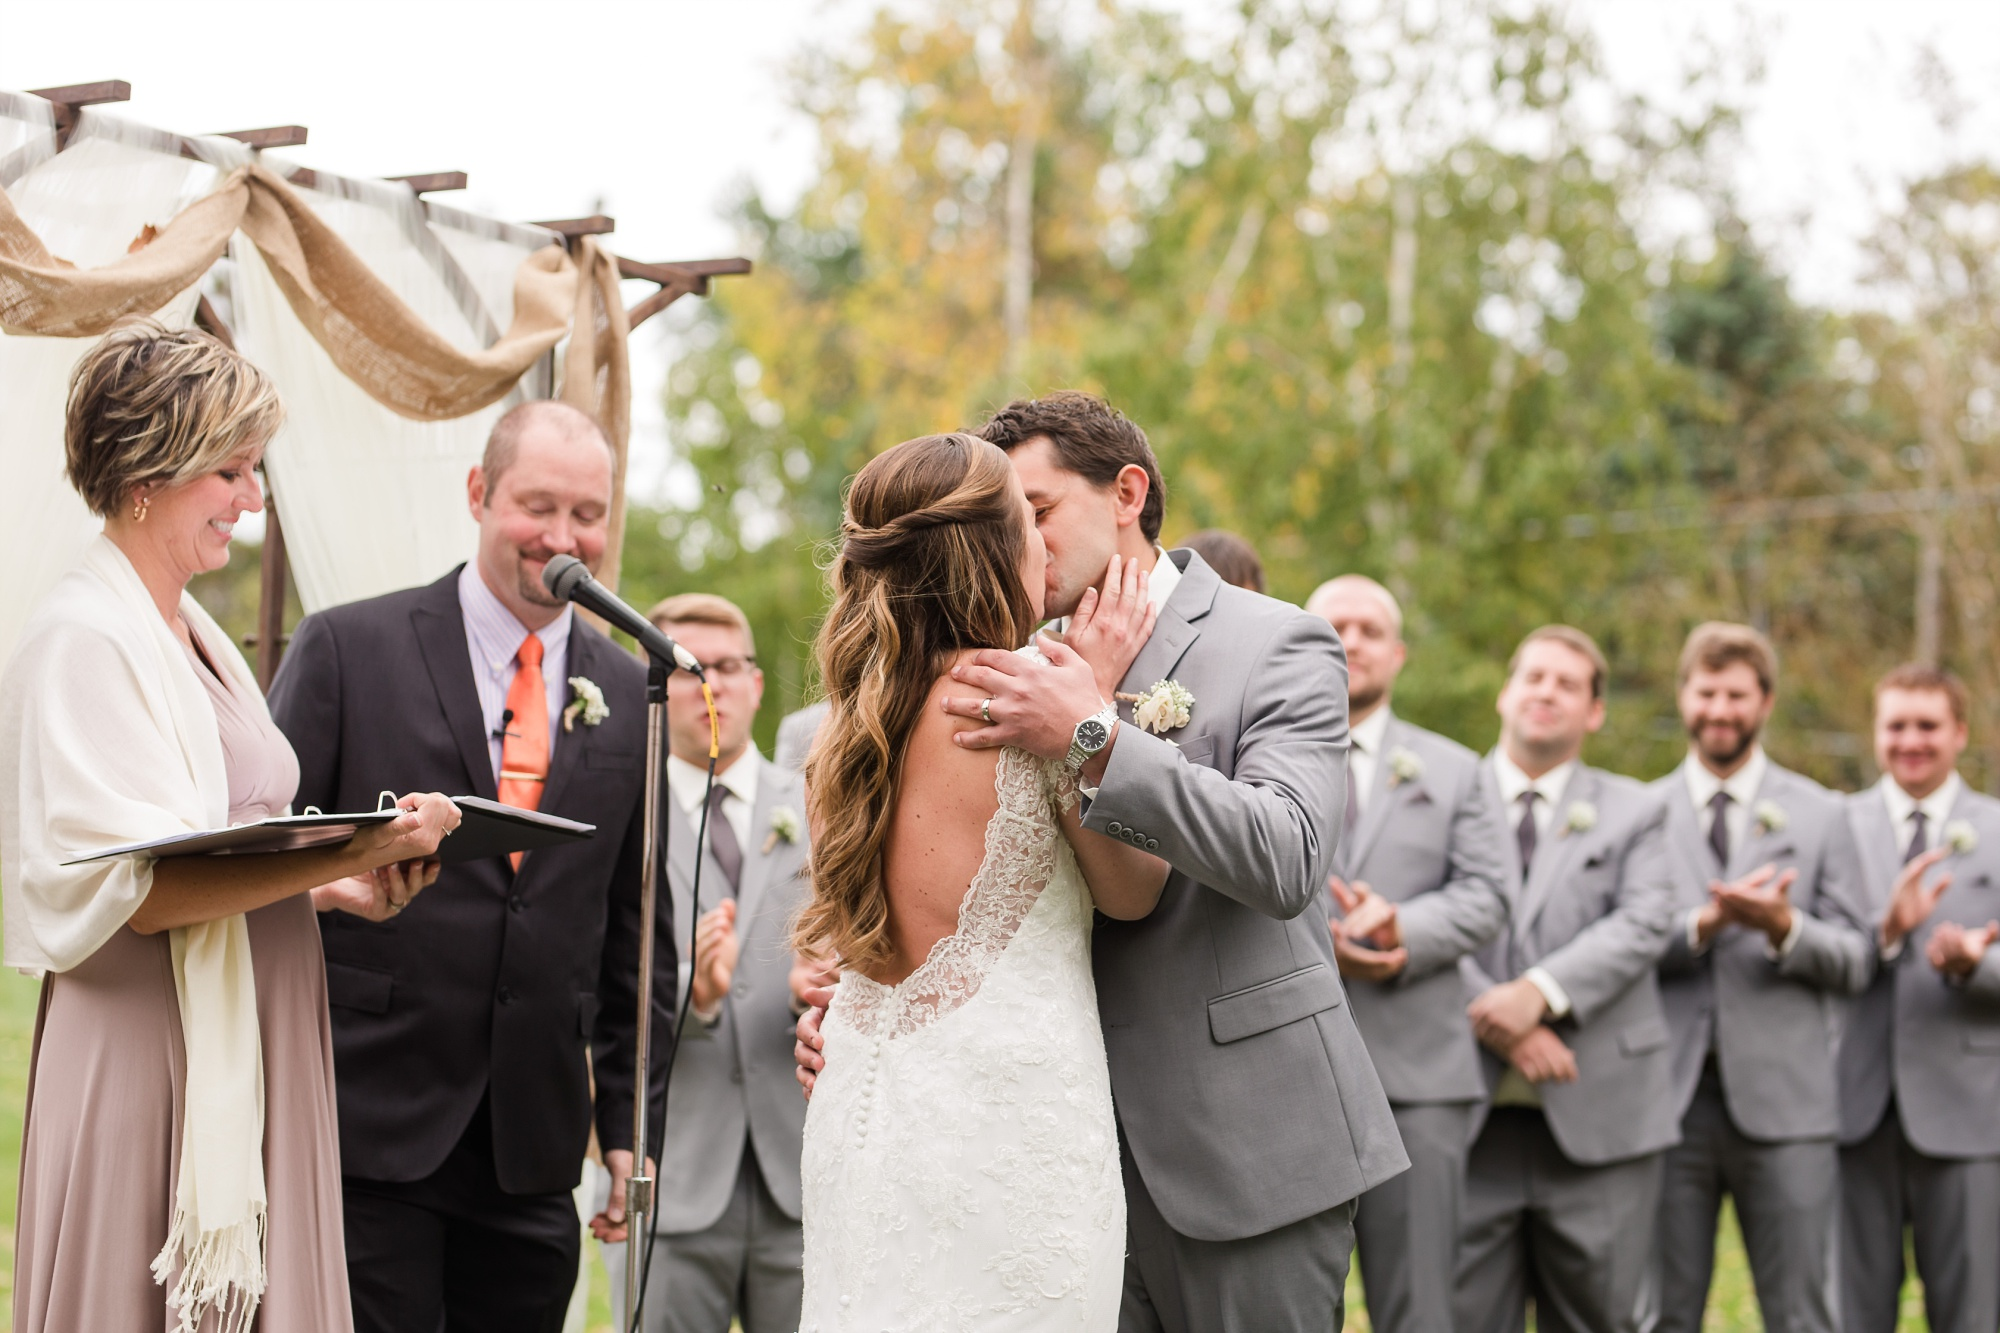 AmberLangerudPhotography_Fair Hills Resort Lakeside Wedding in Minnesota_3468.jpg